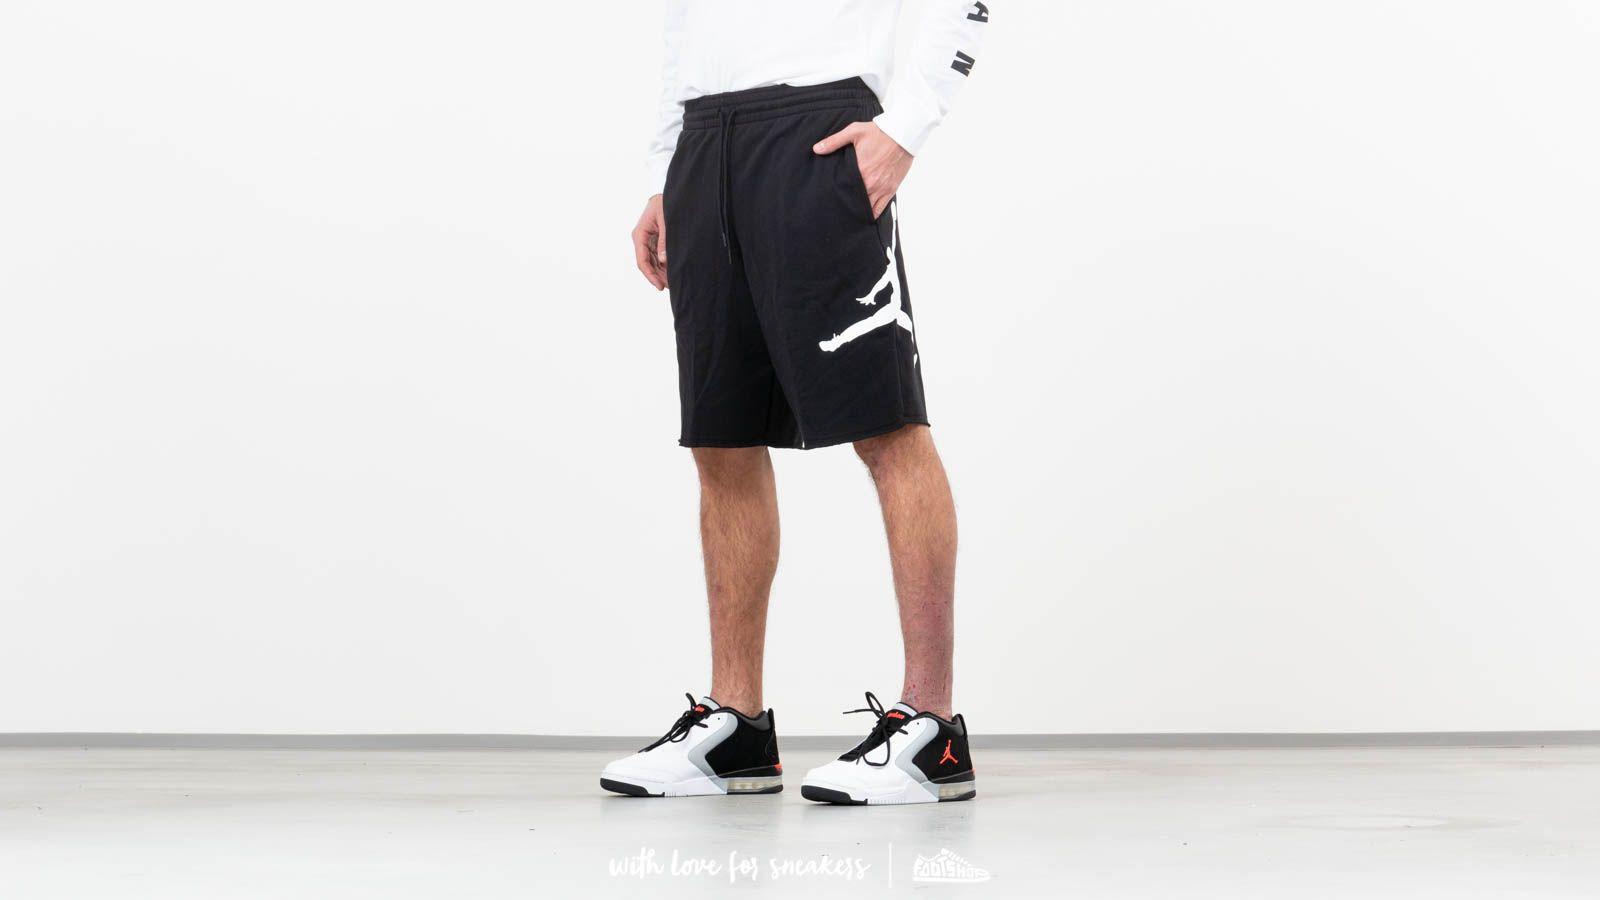 d27dfa497a3 Lyst - Nike Air Fleece Shorts Black in Black for Men